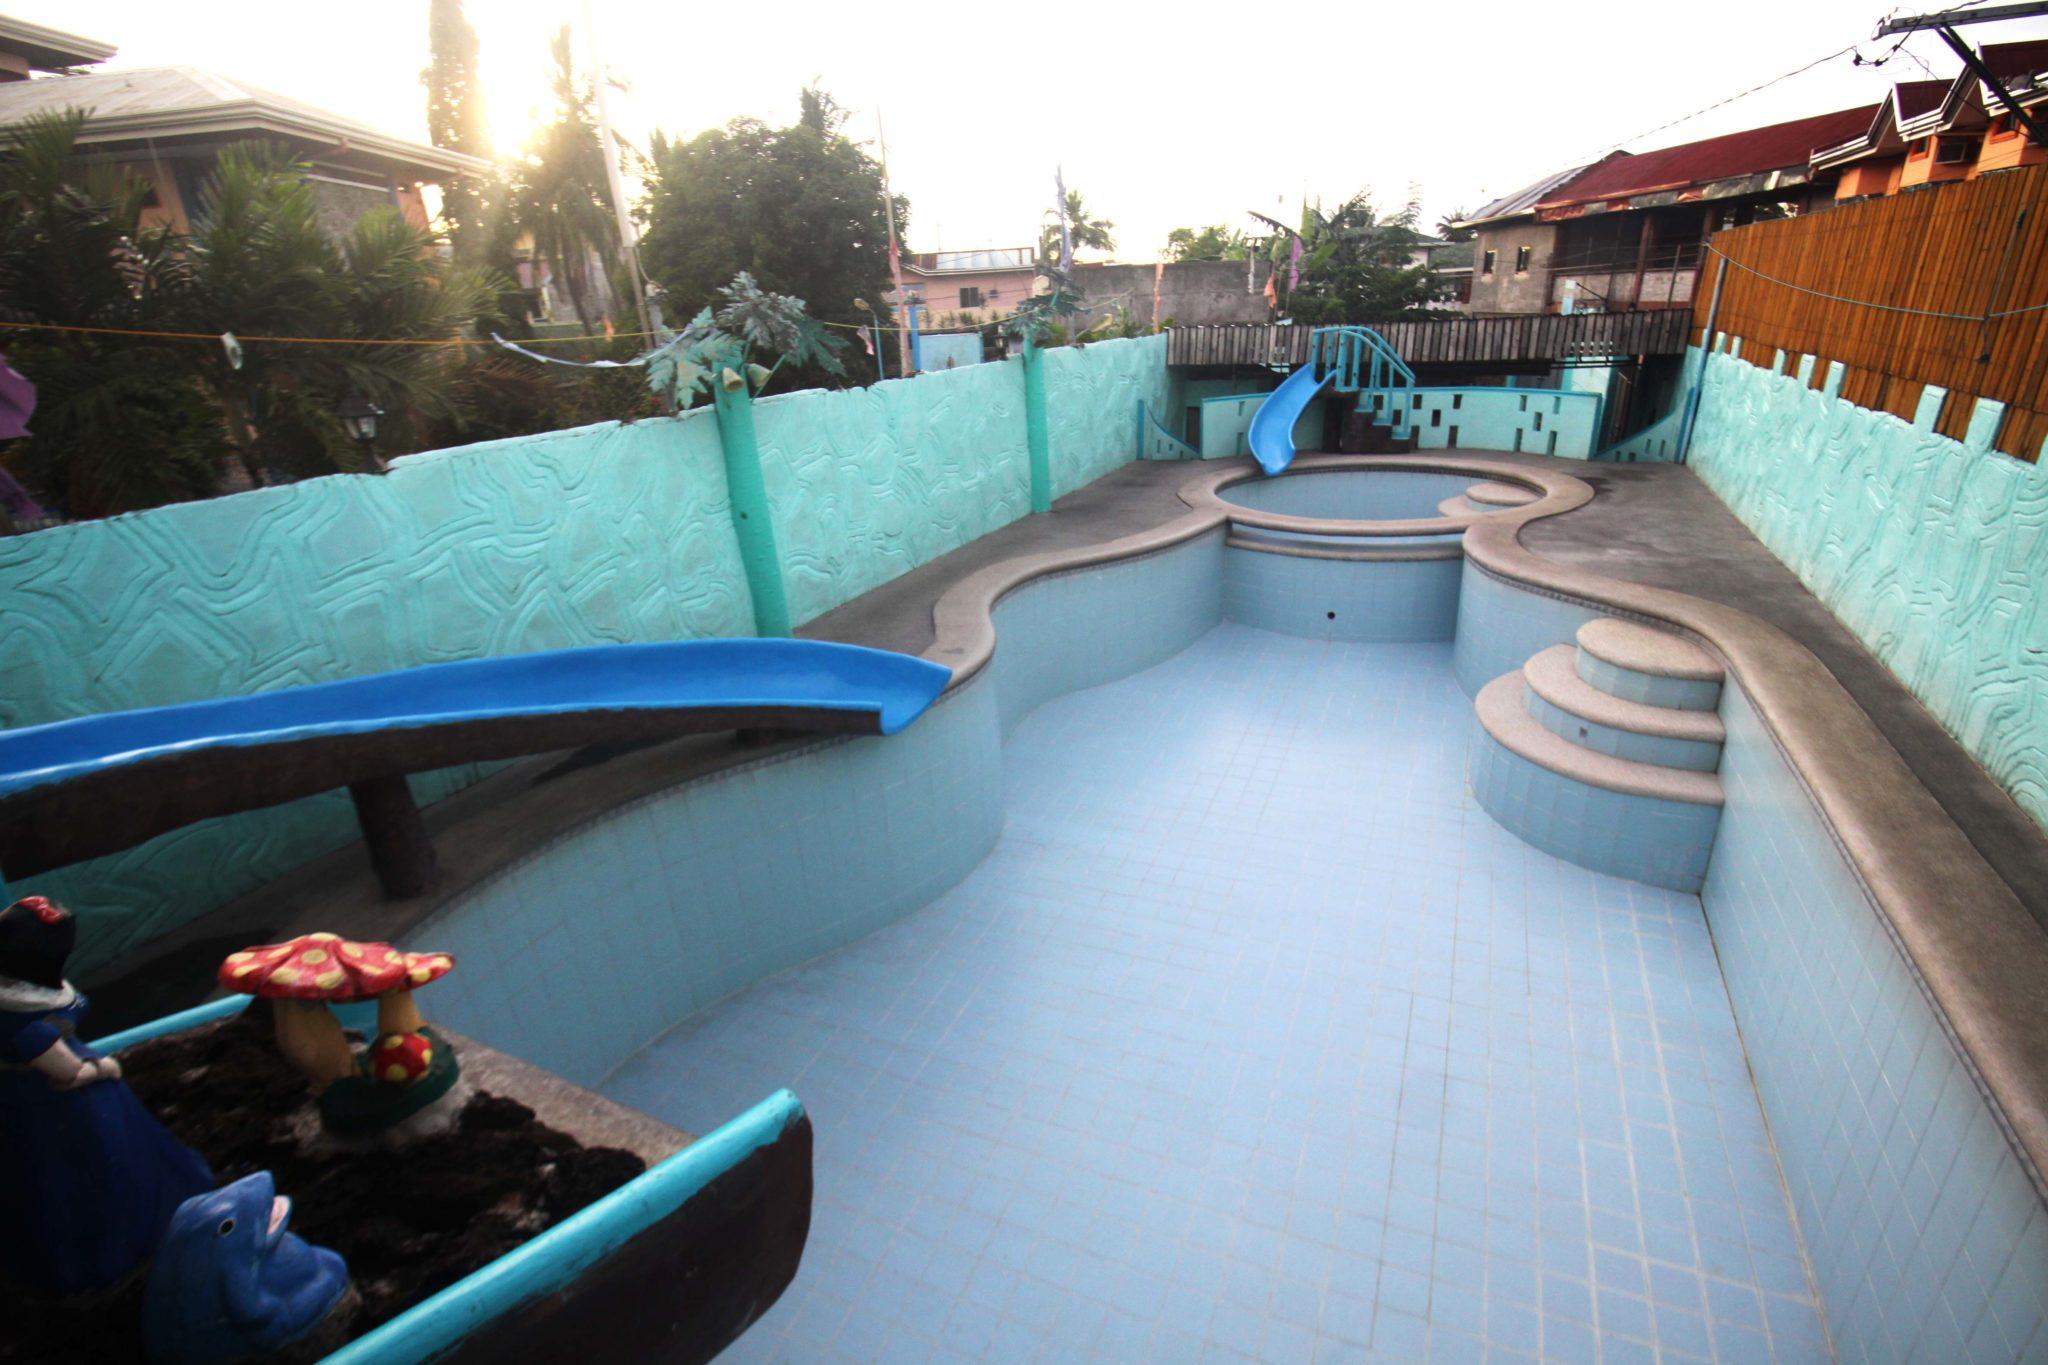 Villa amanda 2 resort affordable private resort in pansol for Affordable private pools in laguna